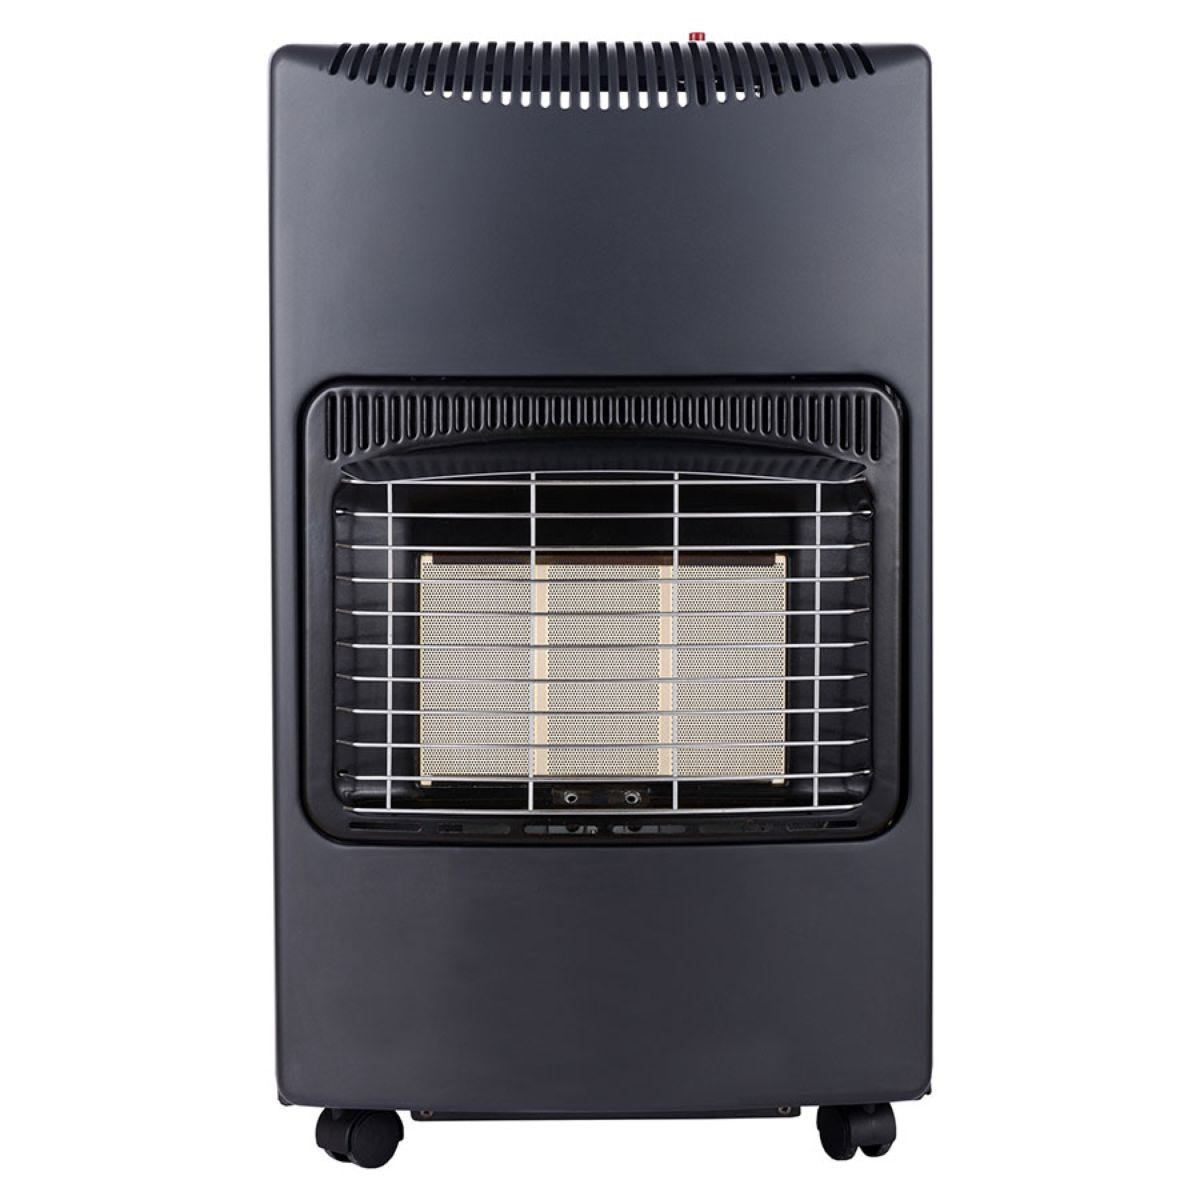 Igenix 4.2kW Portable Gas Heater with Regulator - Black